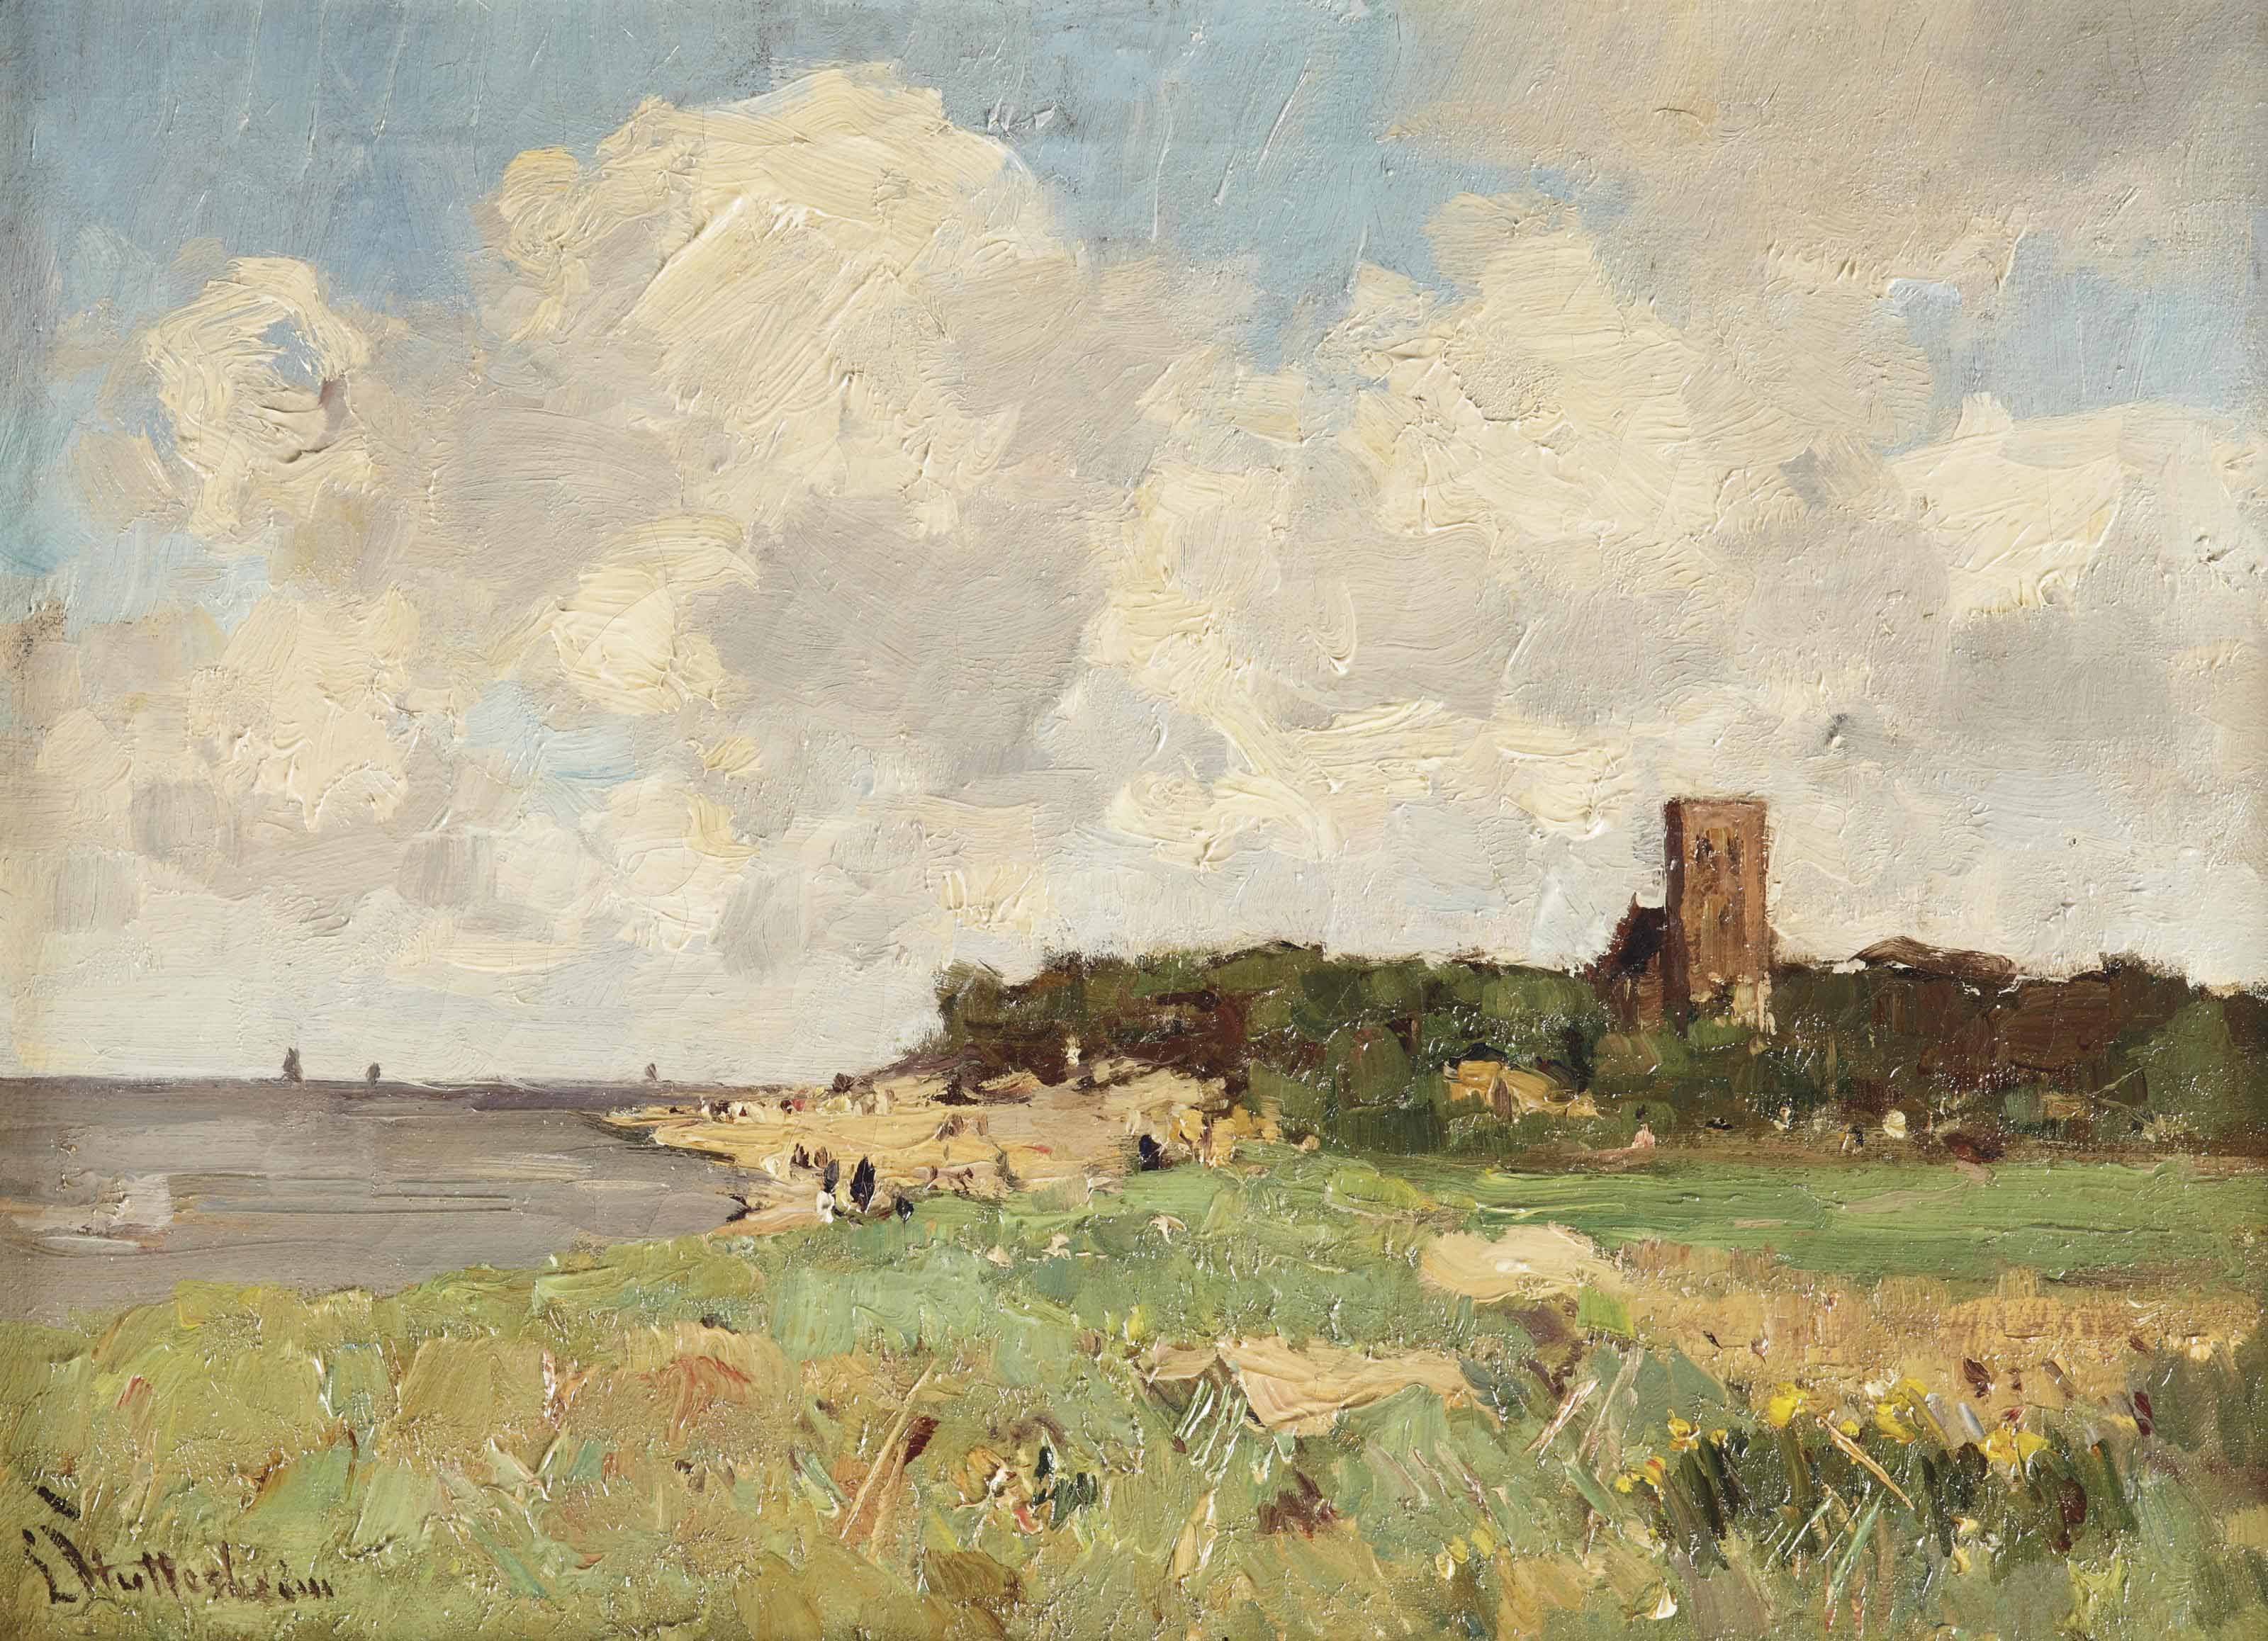 A view of former seaside resort Muiderberg by the Zuiderzee